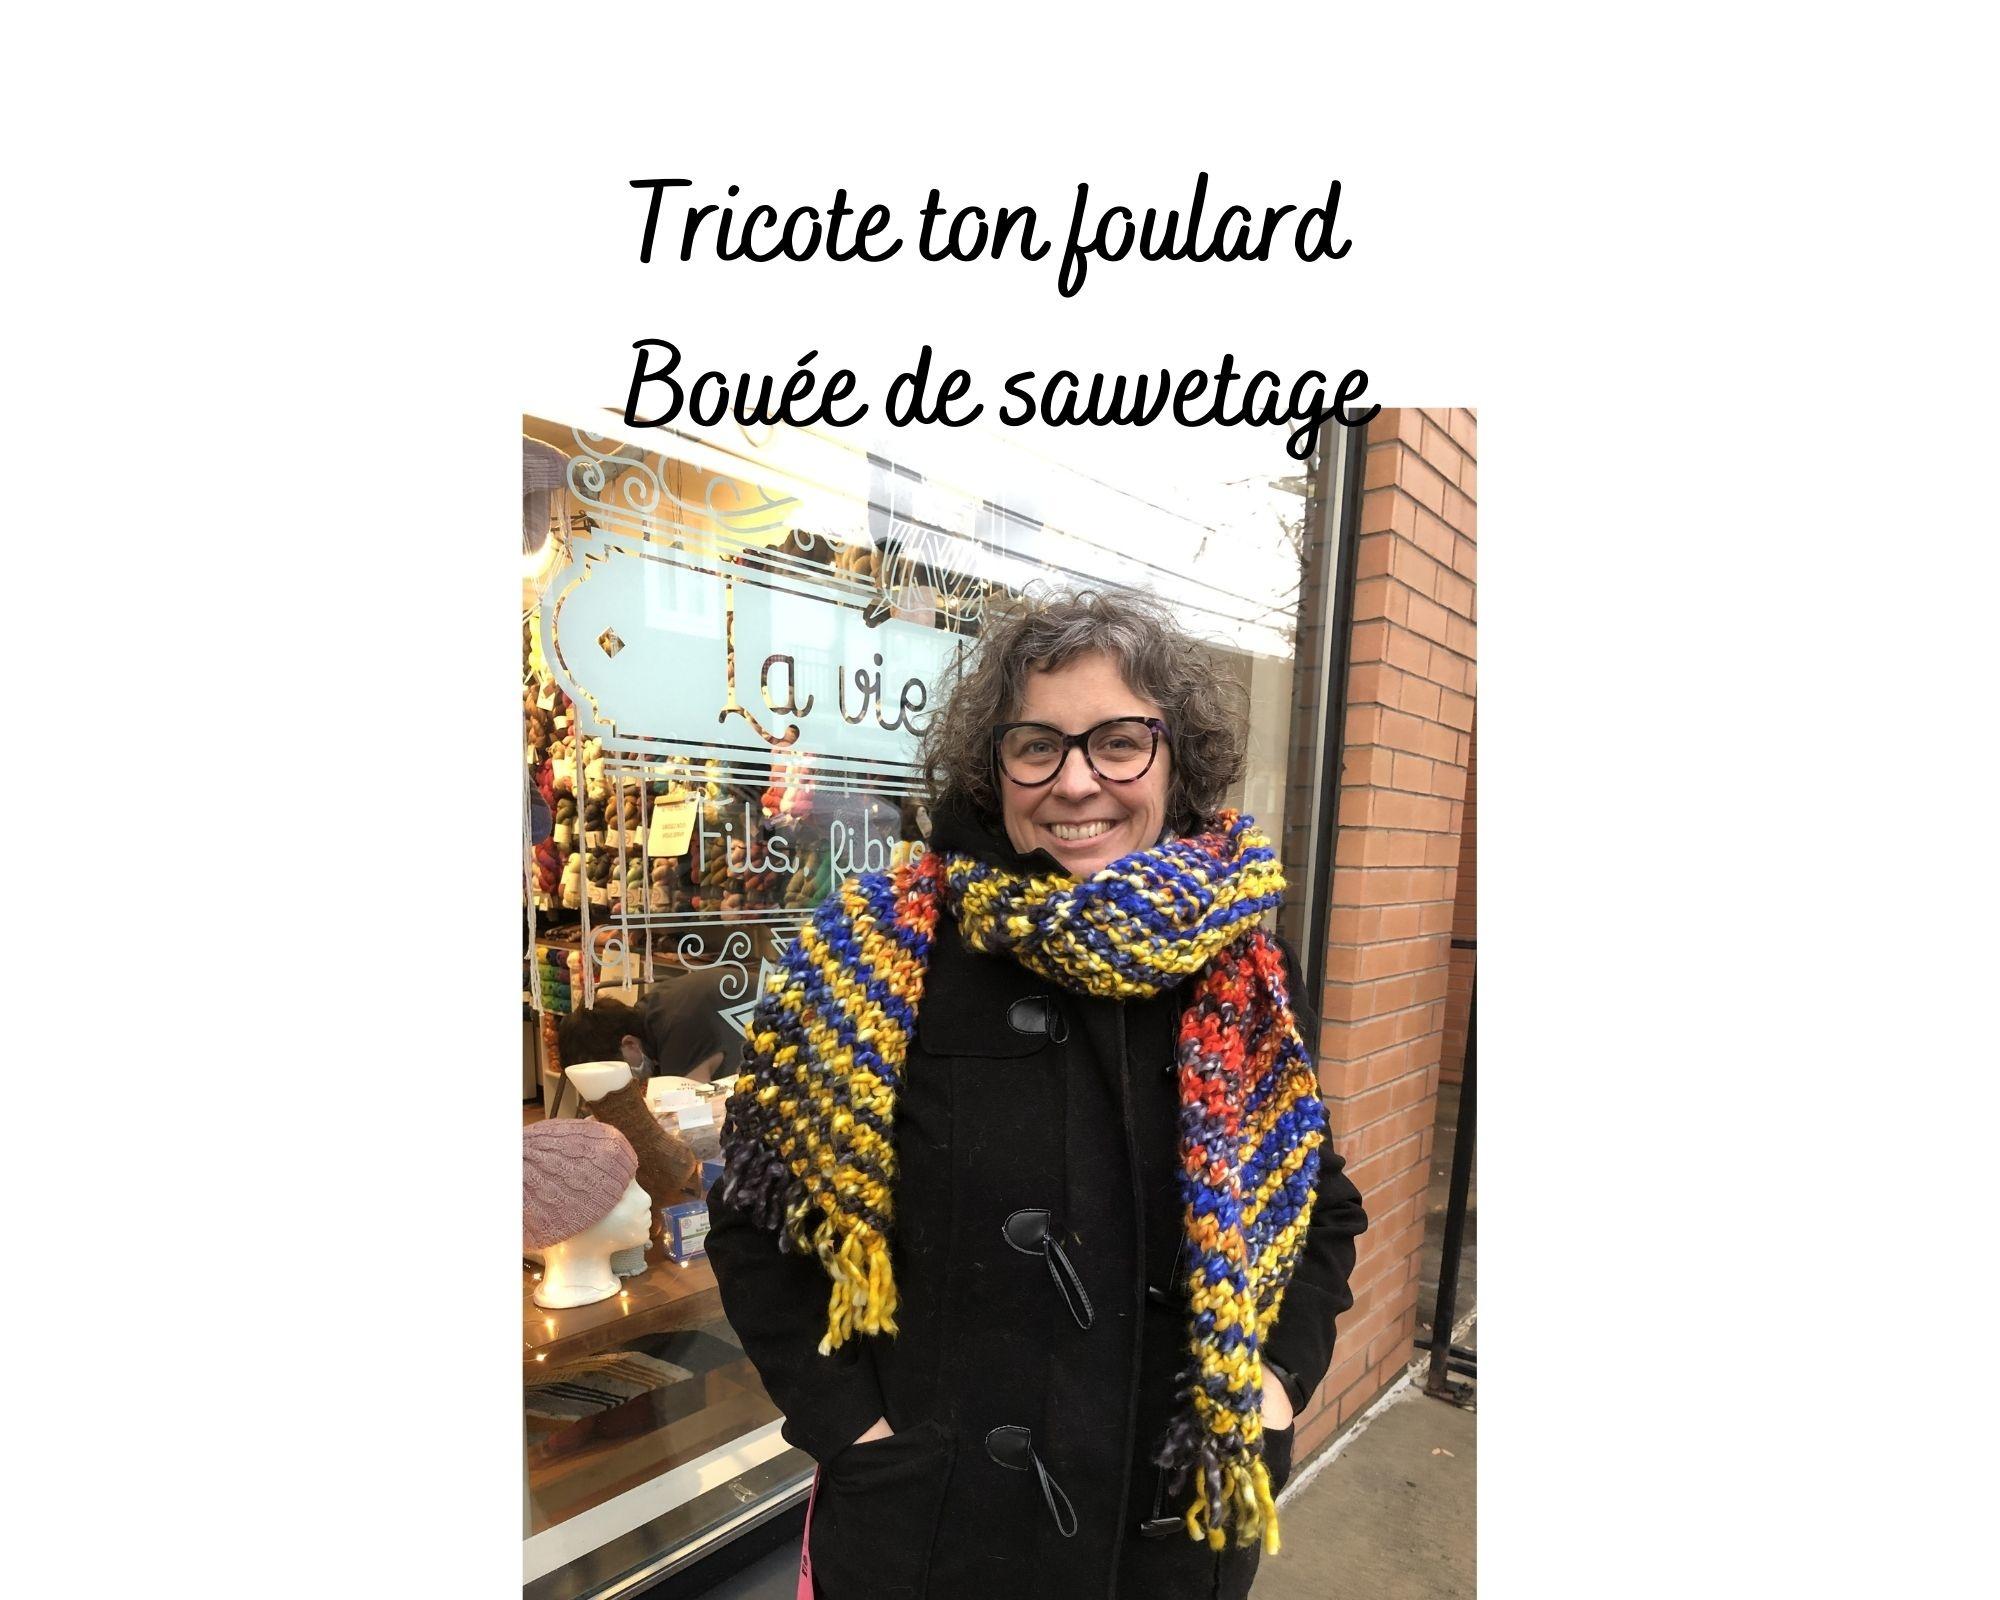 Urth Kit Tricote ton foulard Bouée de sauvetage